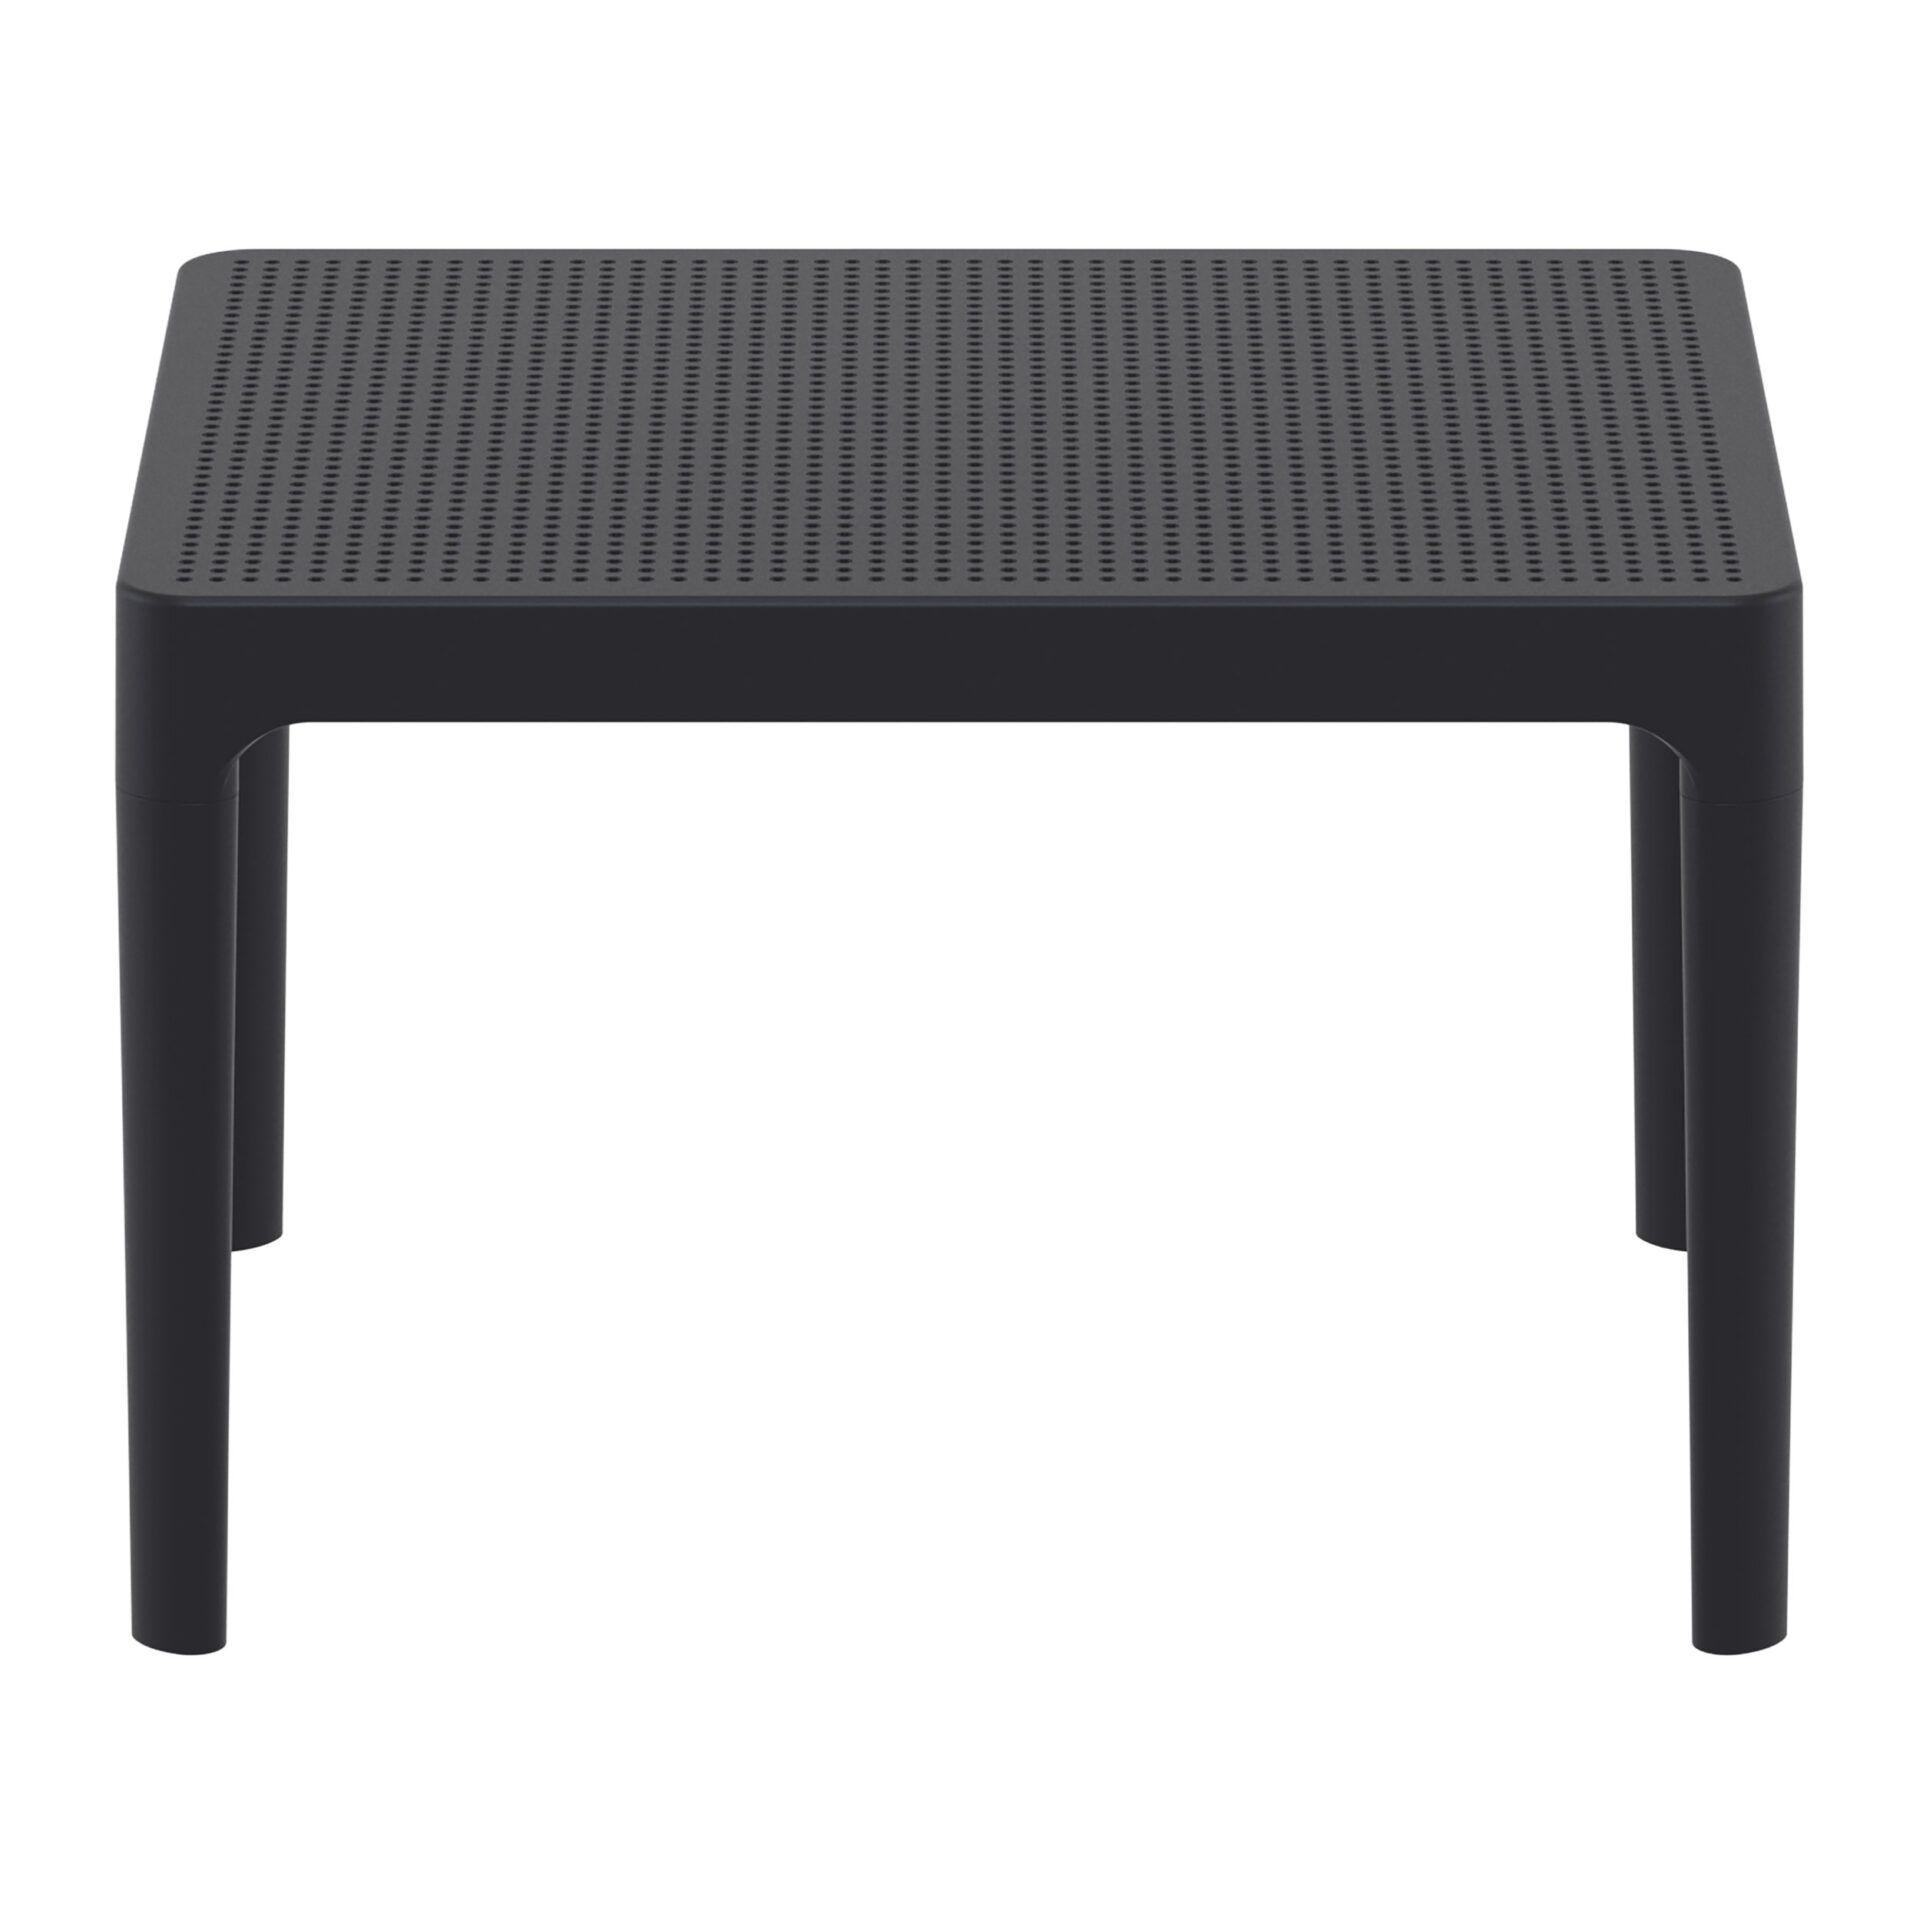 polypropylene outdoor sky side table black long edge